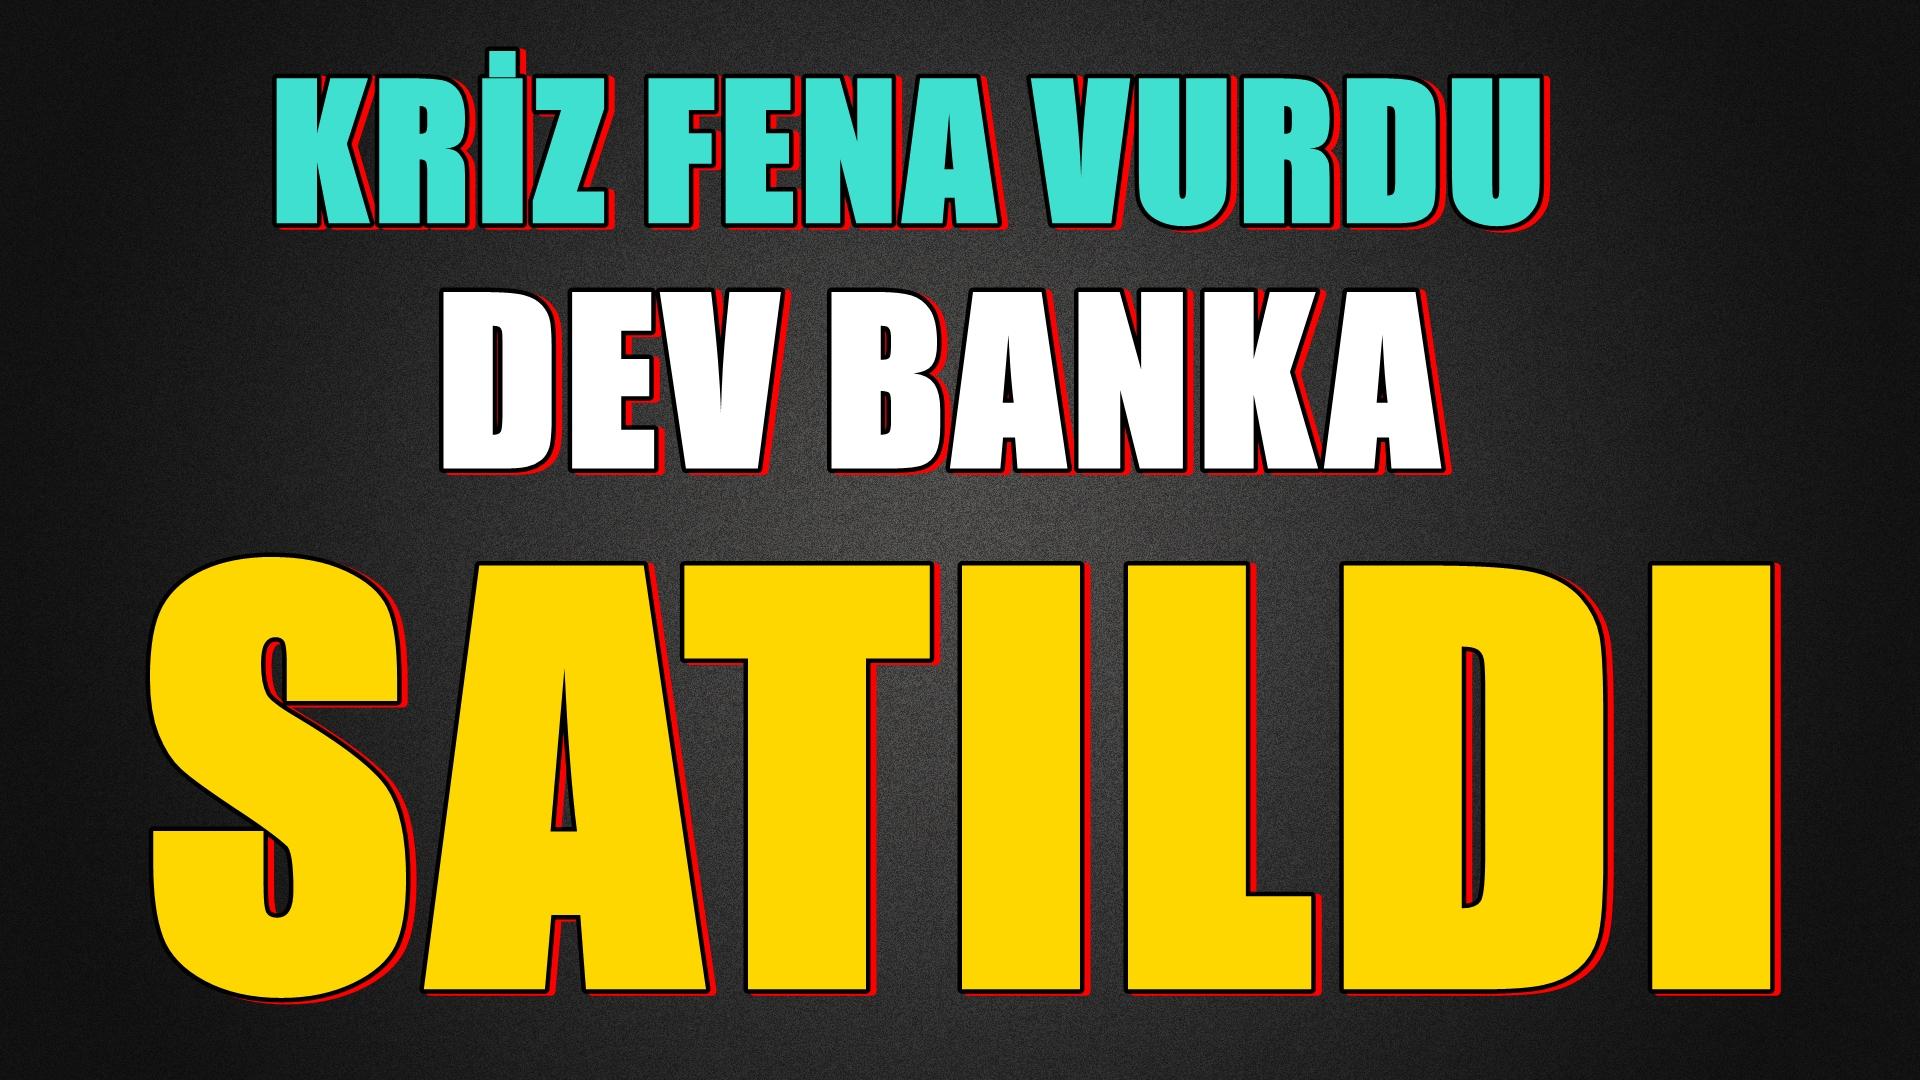 KRİZ FENA VURDU DEV BANKA SATILDI...